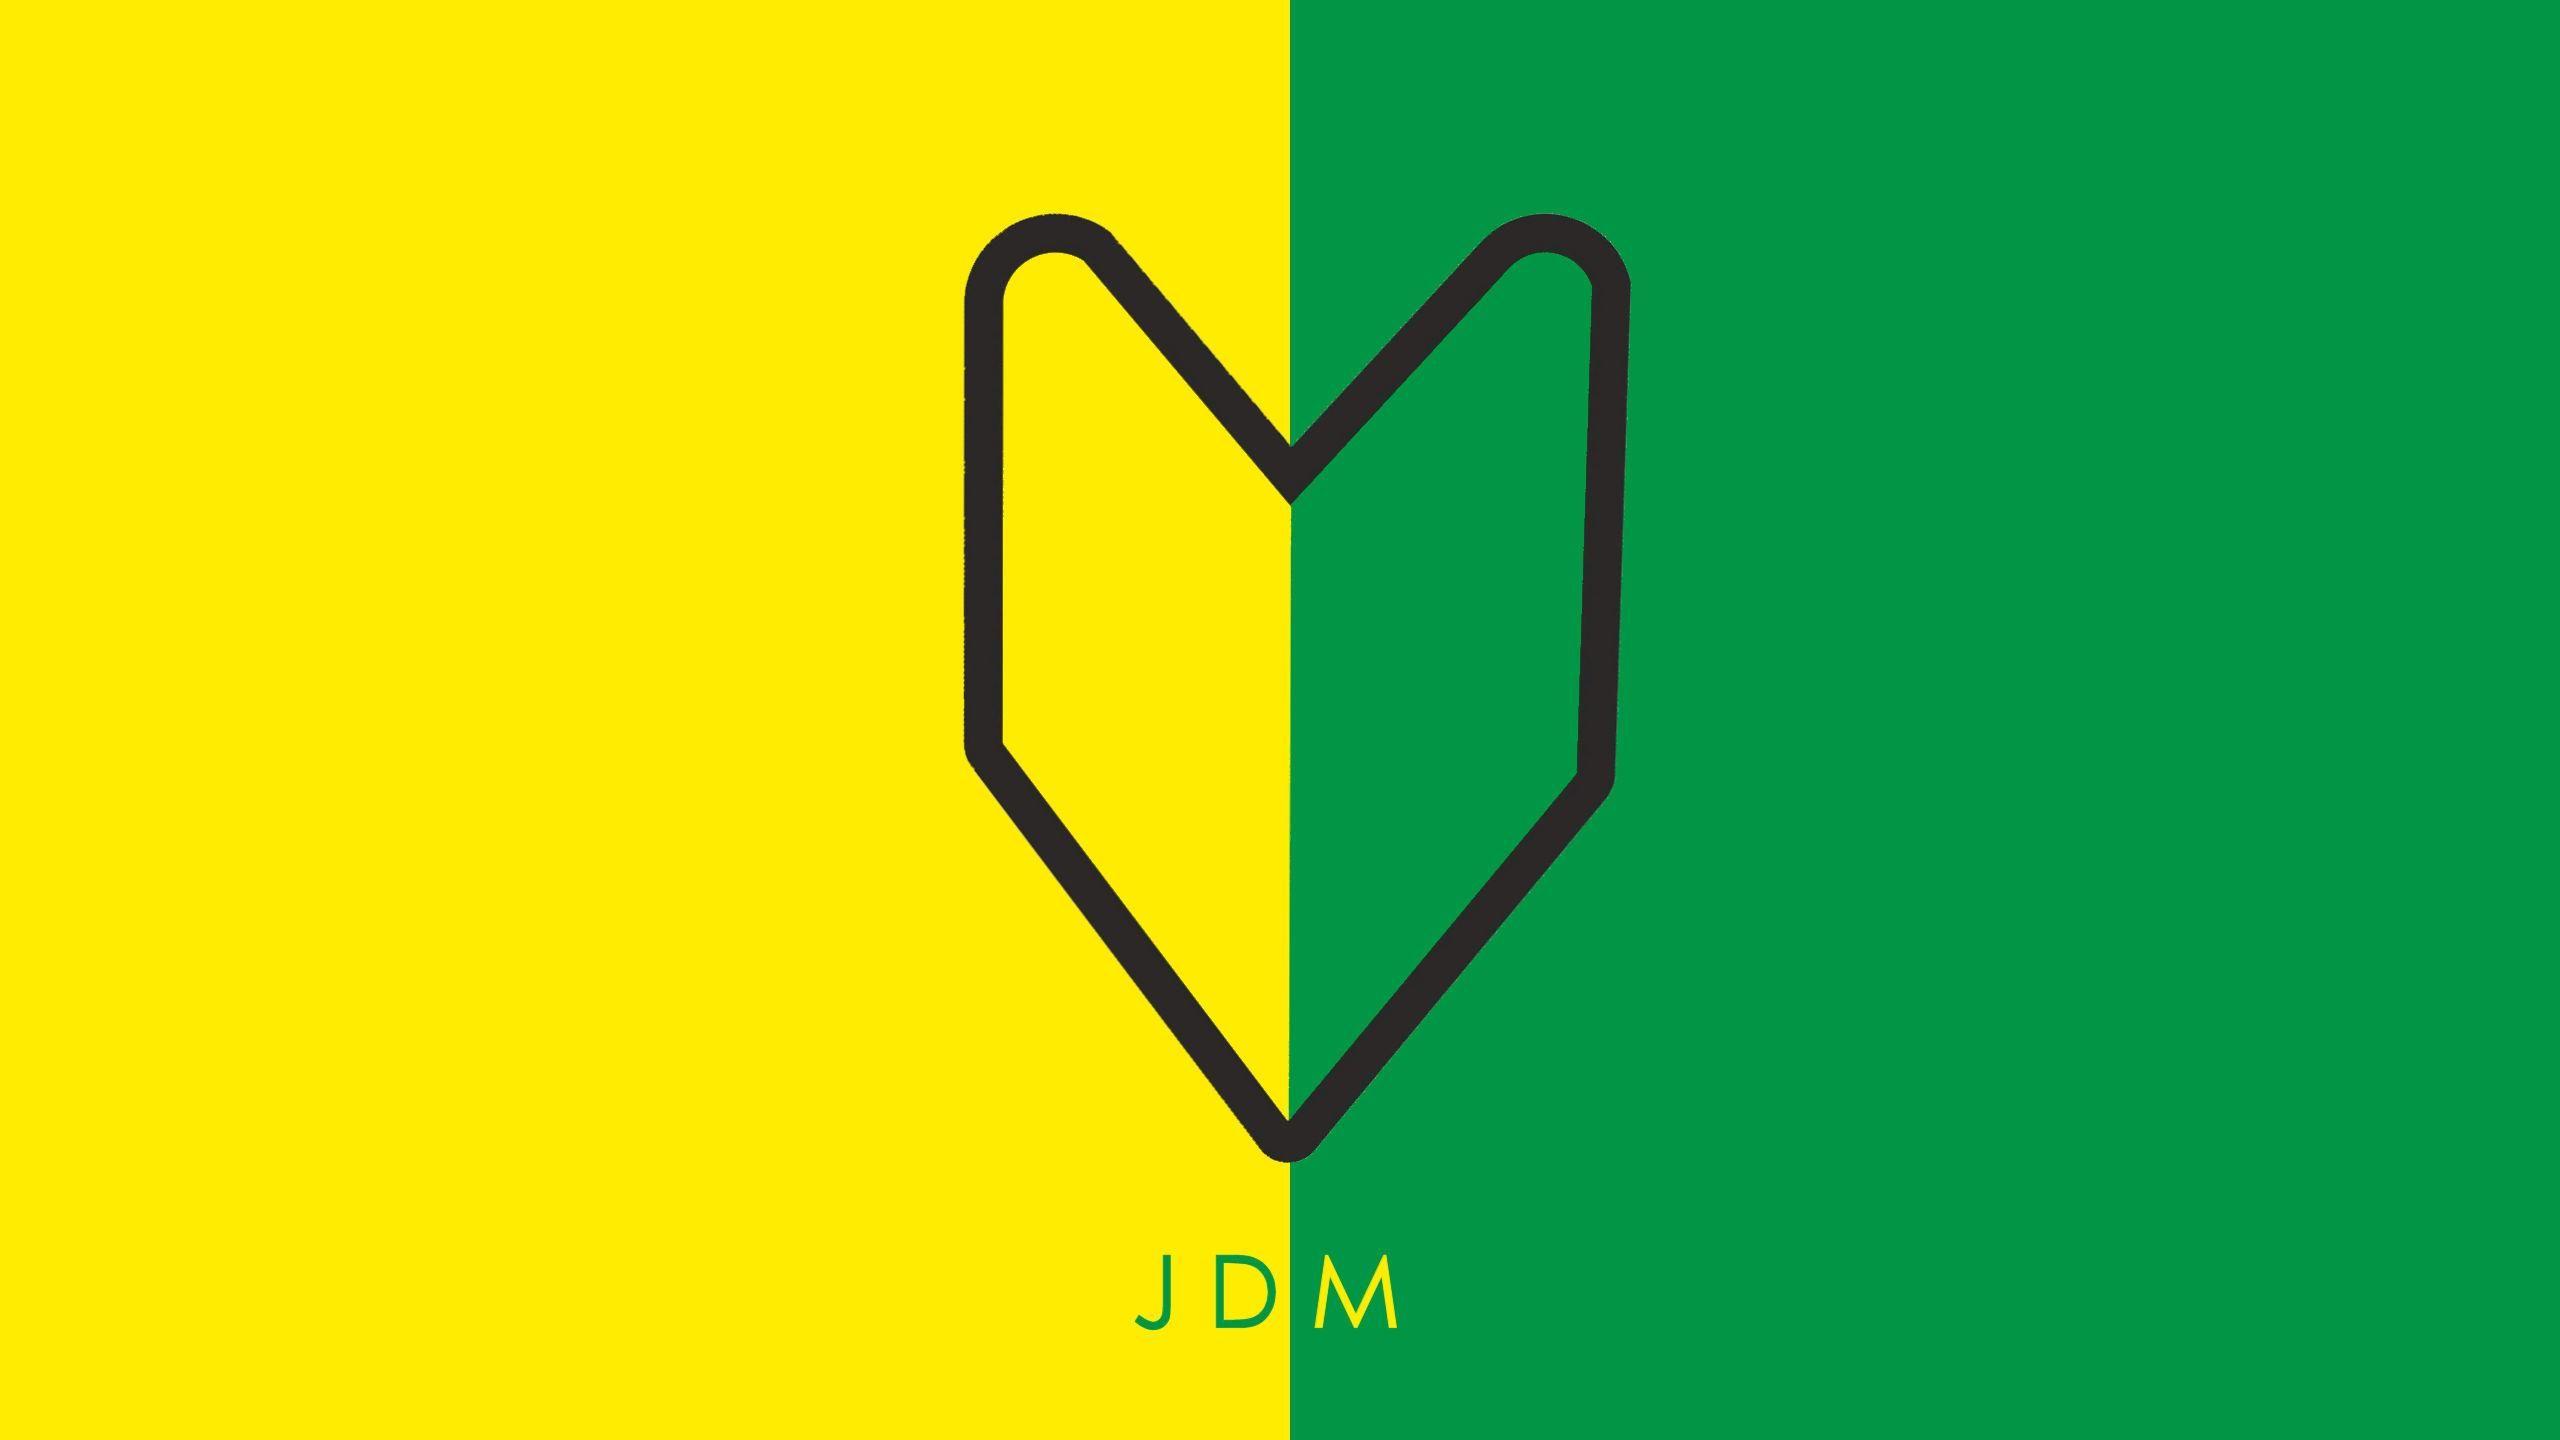 My Jdm Wallpaper 2560x1440 Jdm Wallpaper Jdm Wallpaper